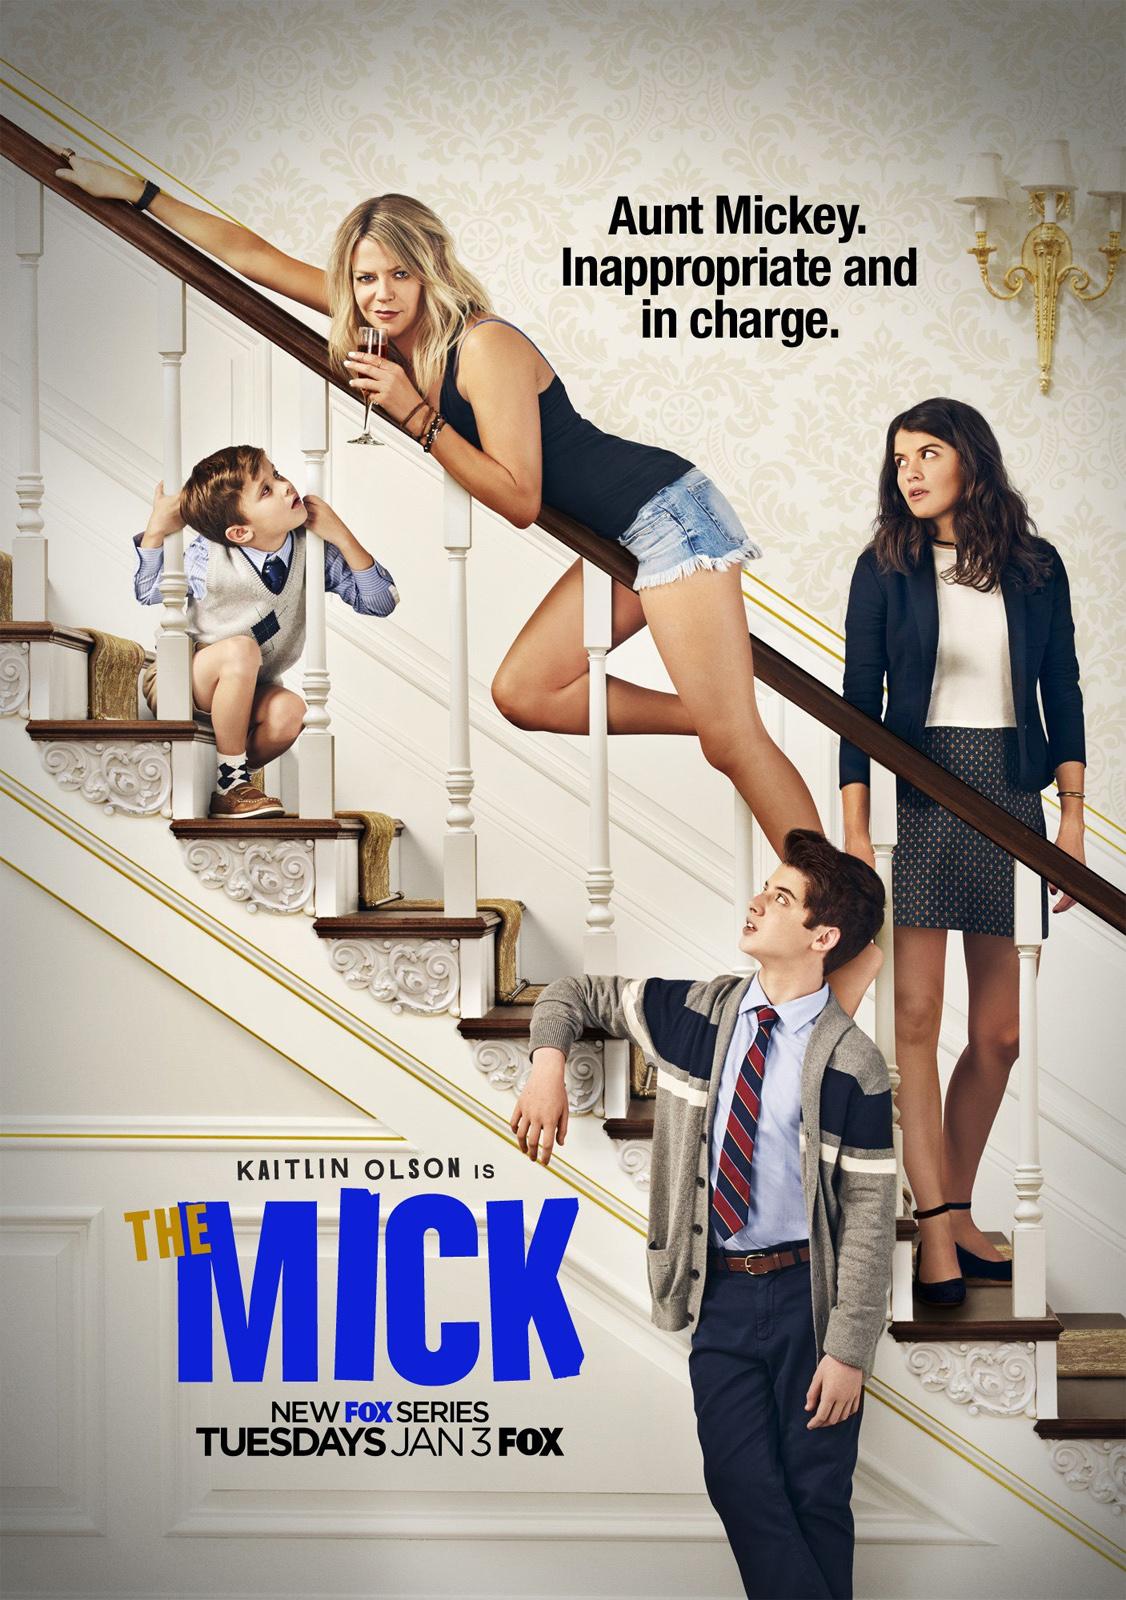 The Mick 2017 : Season 1 - Full (1/8)